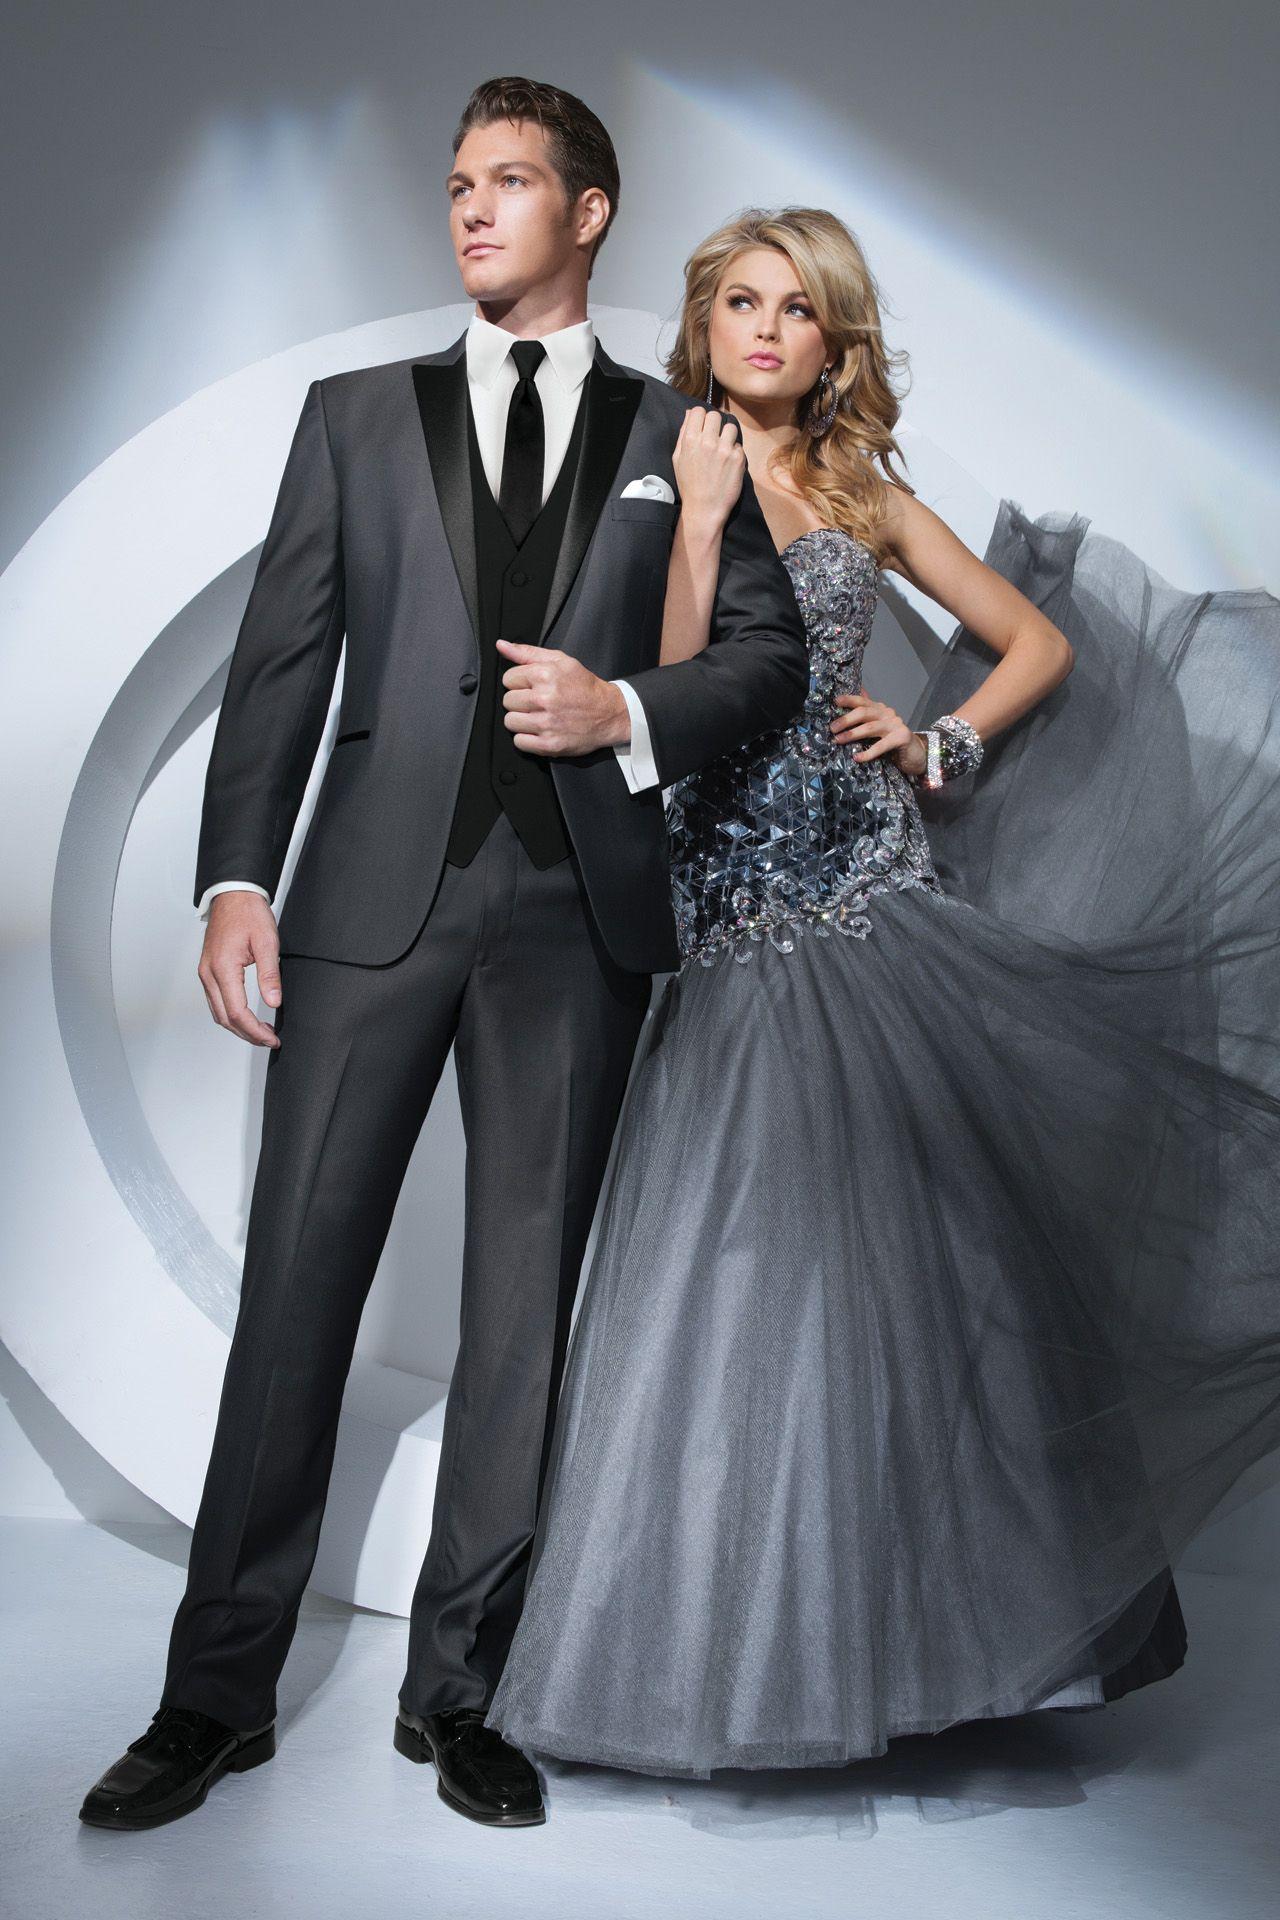 Tony bowls grey portofino slim fit tuxedo jimus formal wear pram